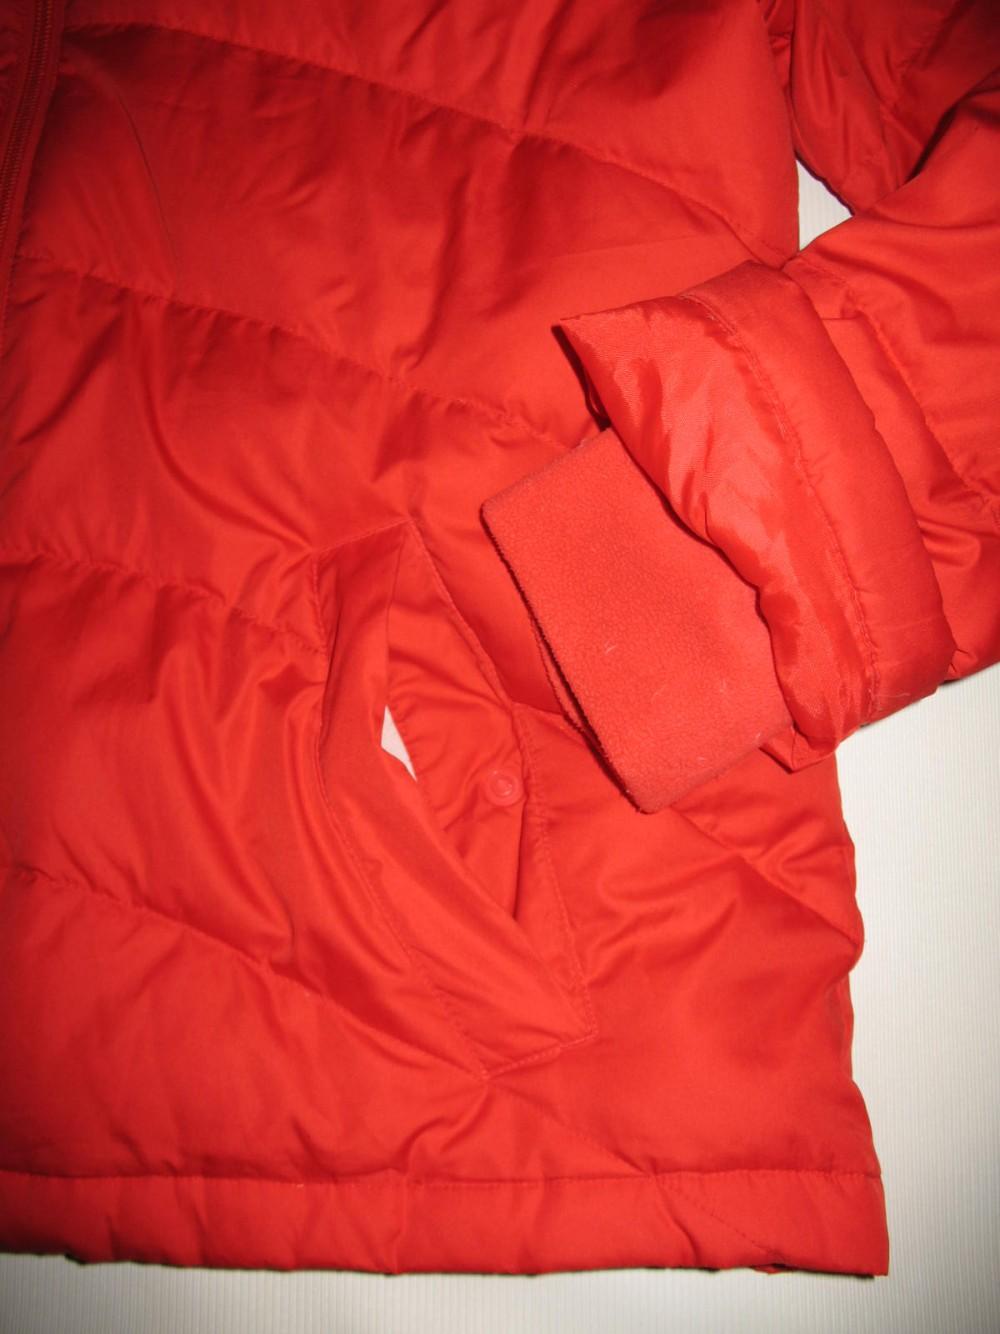 Куртка LANDSEND down jacket lady (размер M/L) - 6